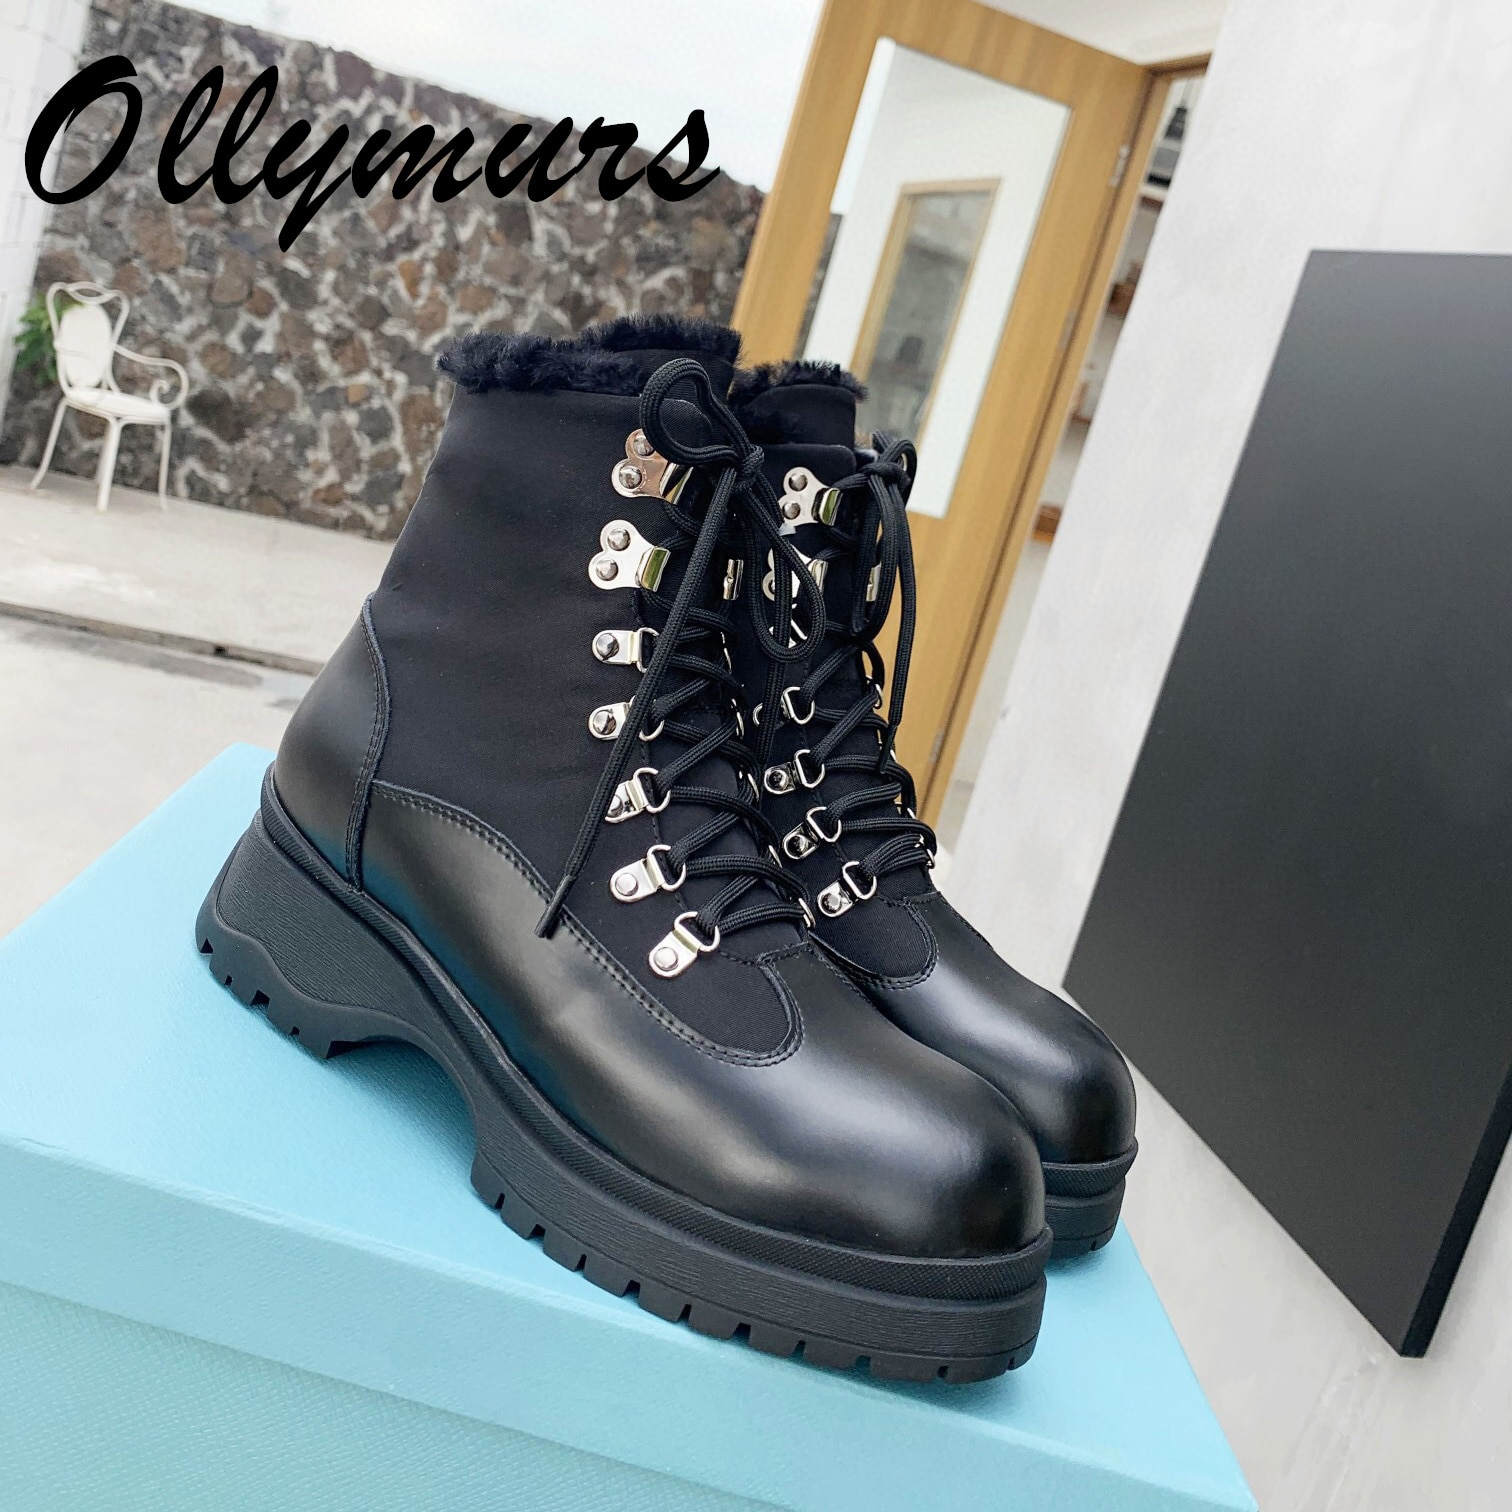 Ollymurs New Genuine Leather Winter Fur Warm Snow Boots Lace Up Platform Luxury Designer Ankle Heel